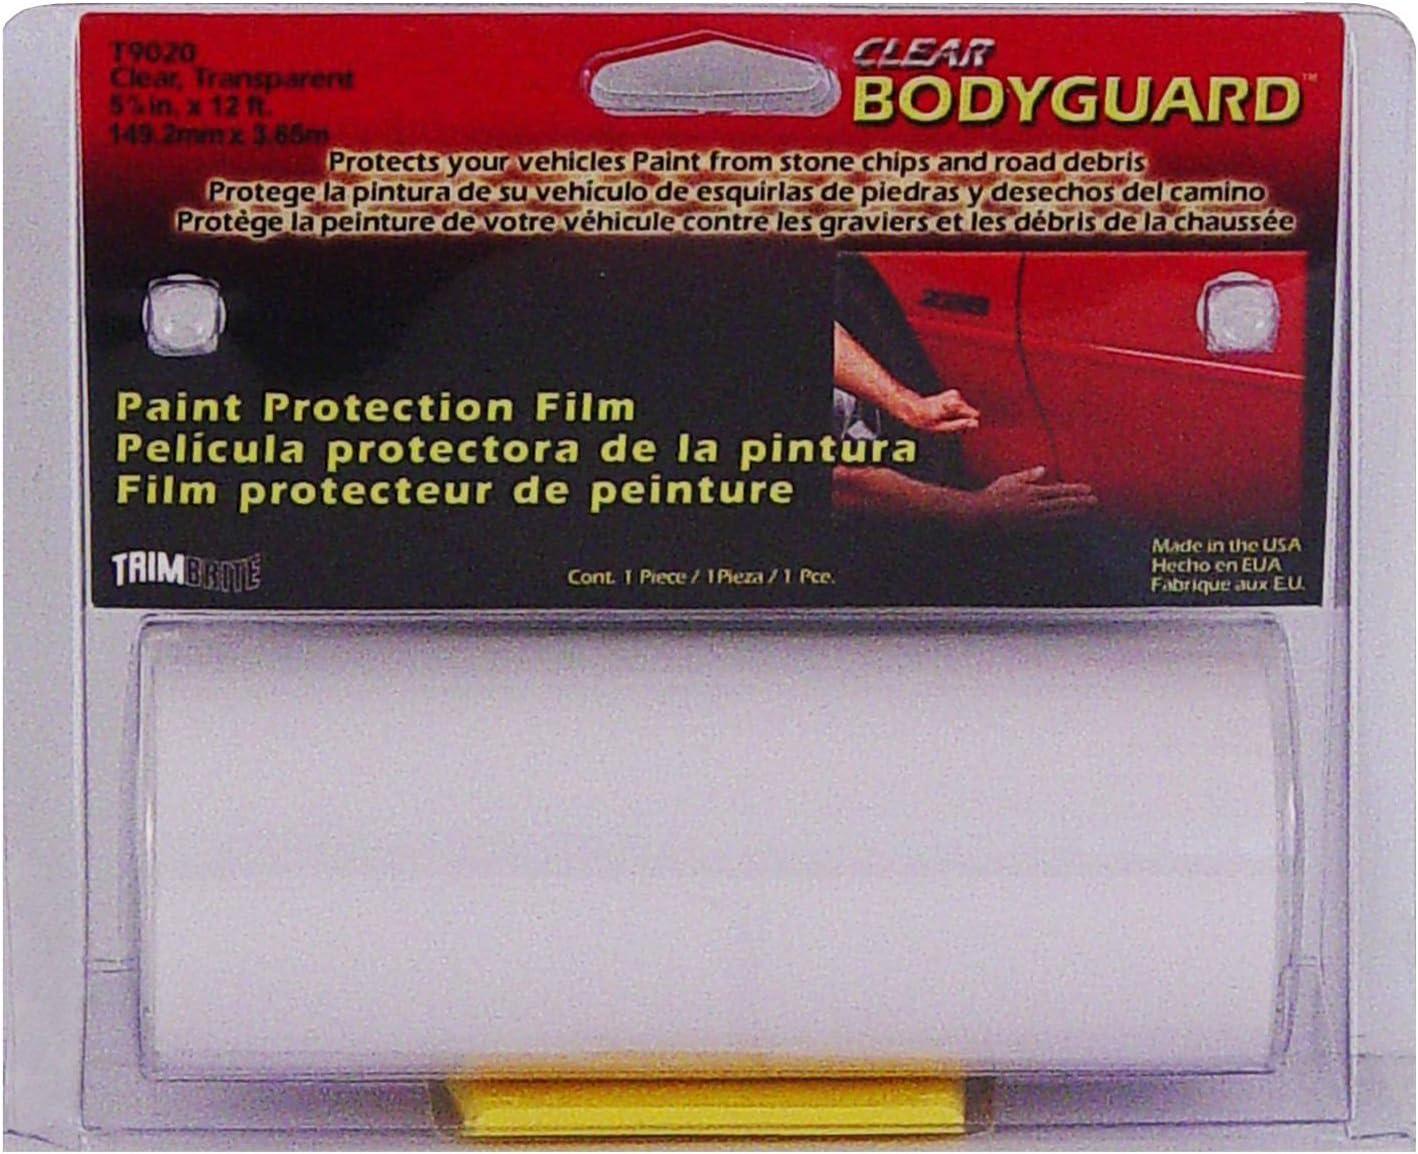 Trimbrite T9020 Body Guard Clear Film Kit